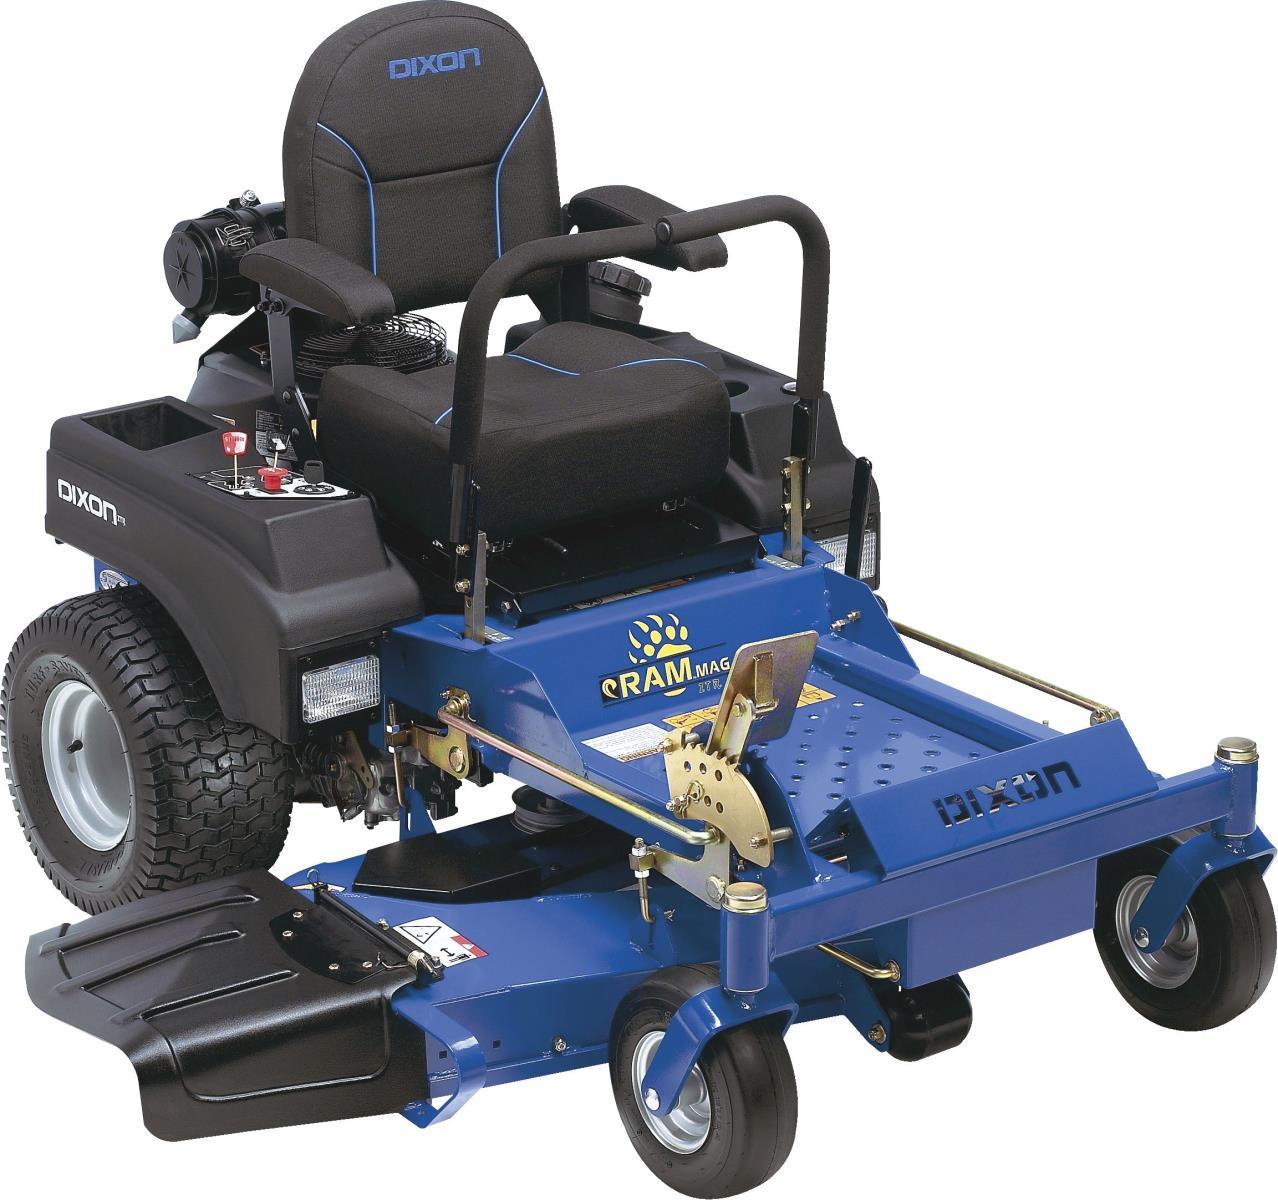 dixon ram mag parts dixon ram mag mower partsselect your model below